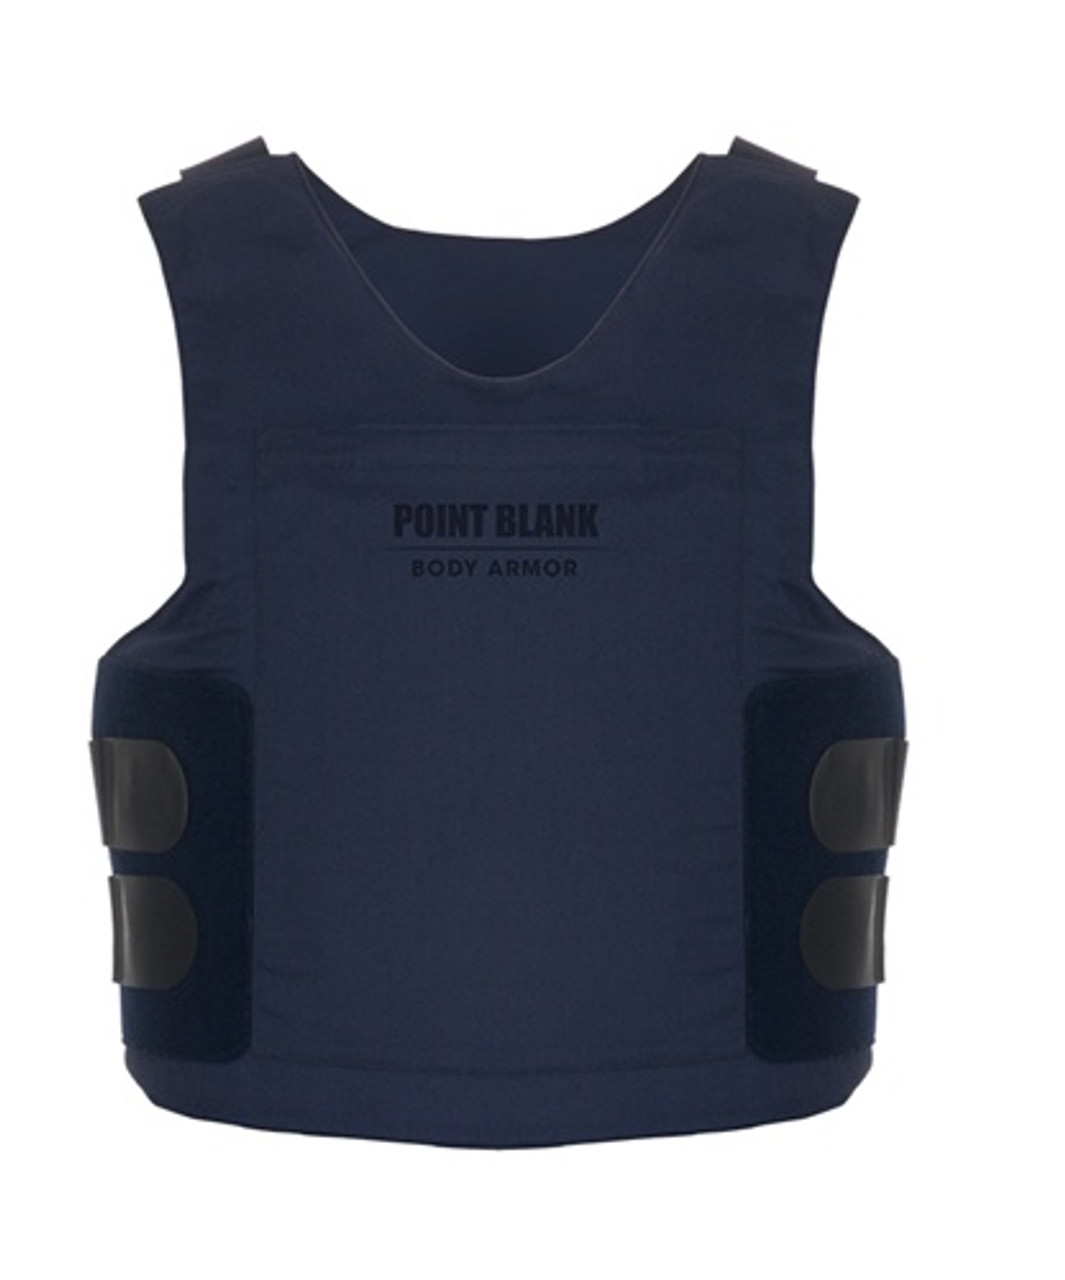 Point Blank Body Armor C-Series Vest Bullet Resistant Vest